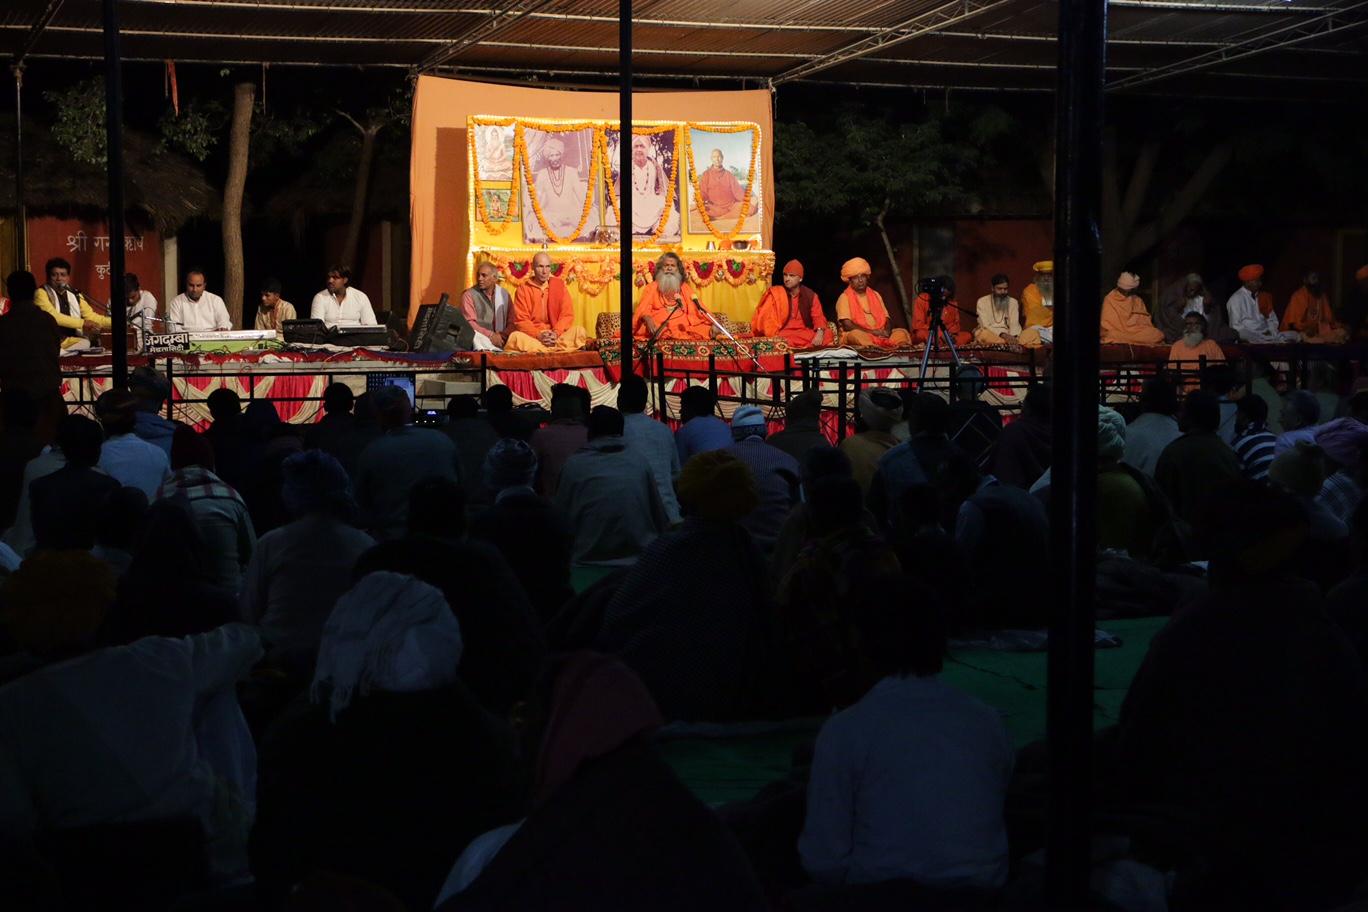 přednáška Višvaguru Mahéšvaránand a Óm ášram